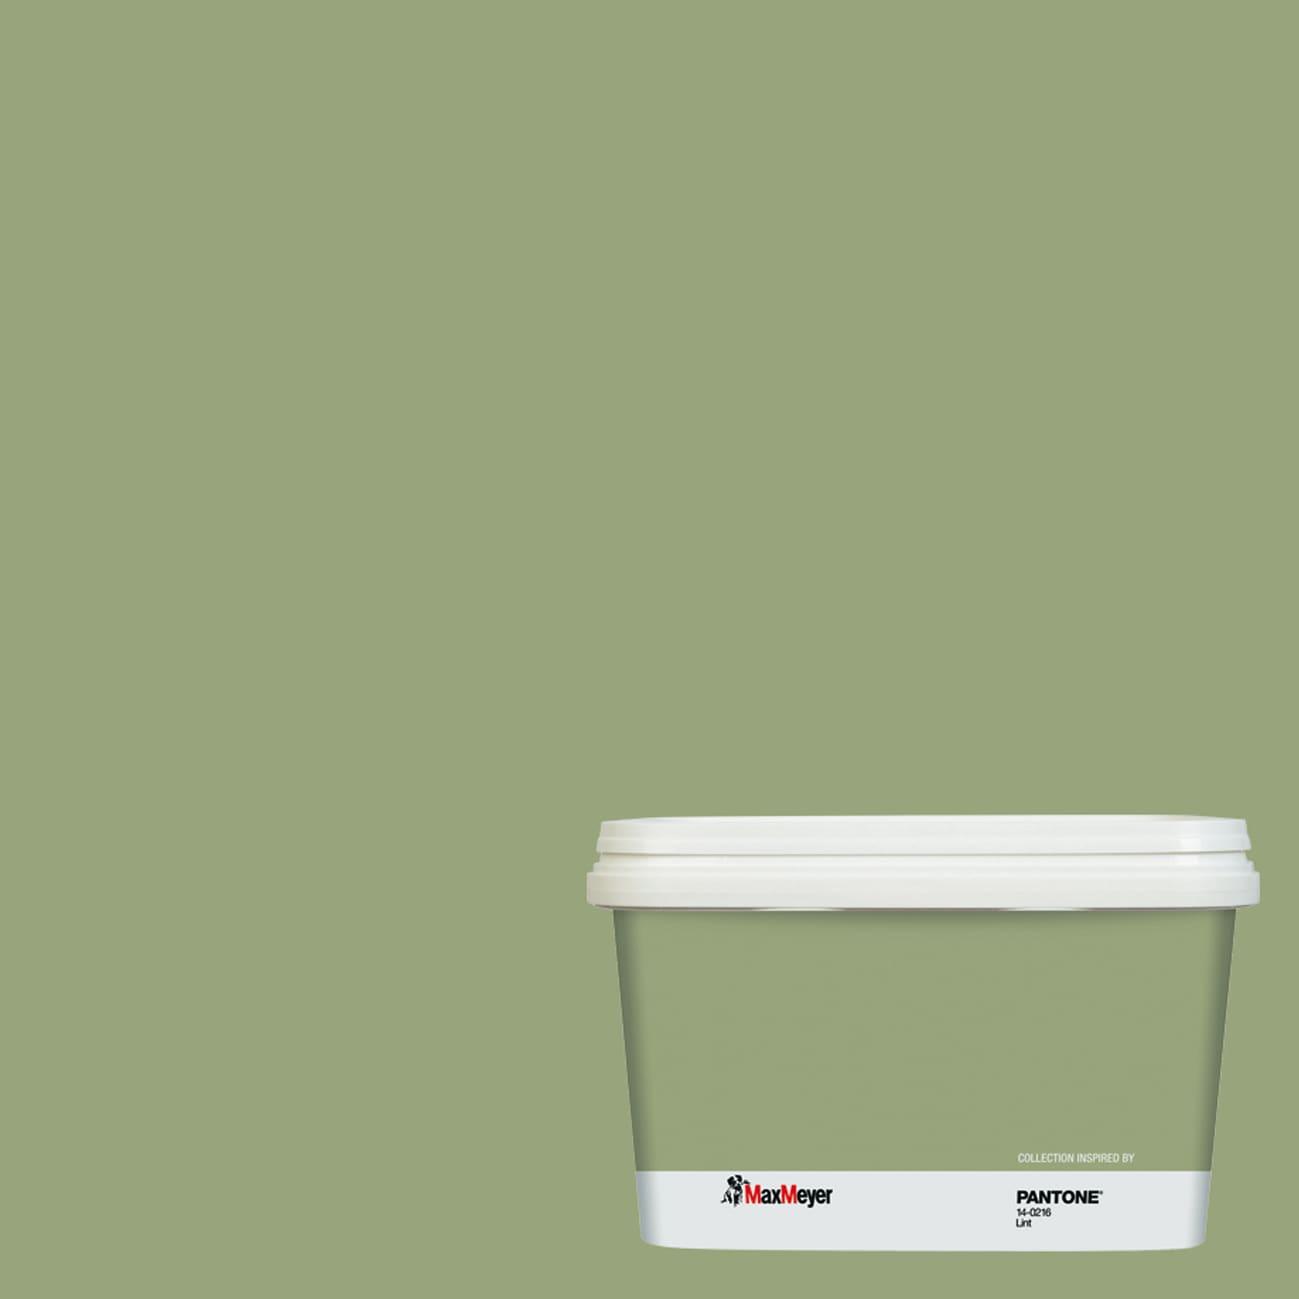 Idropittura Superlavabile Lint 2 L Pantone Prezzi E Offerte Online